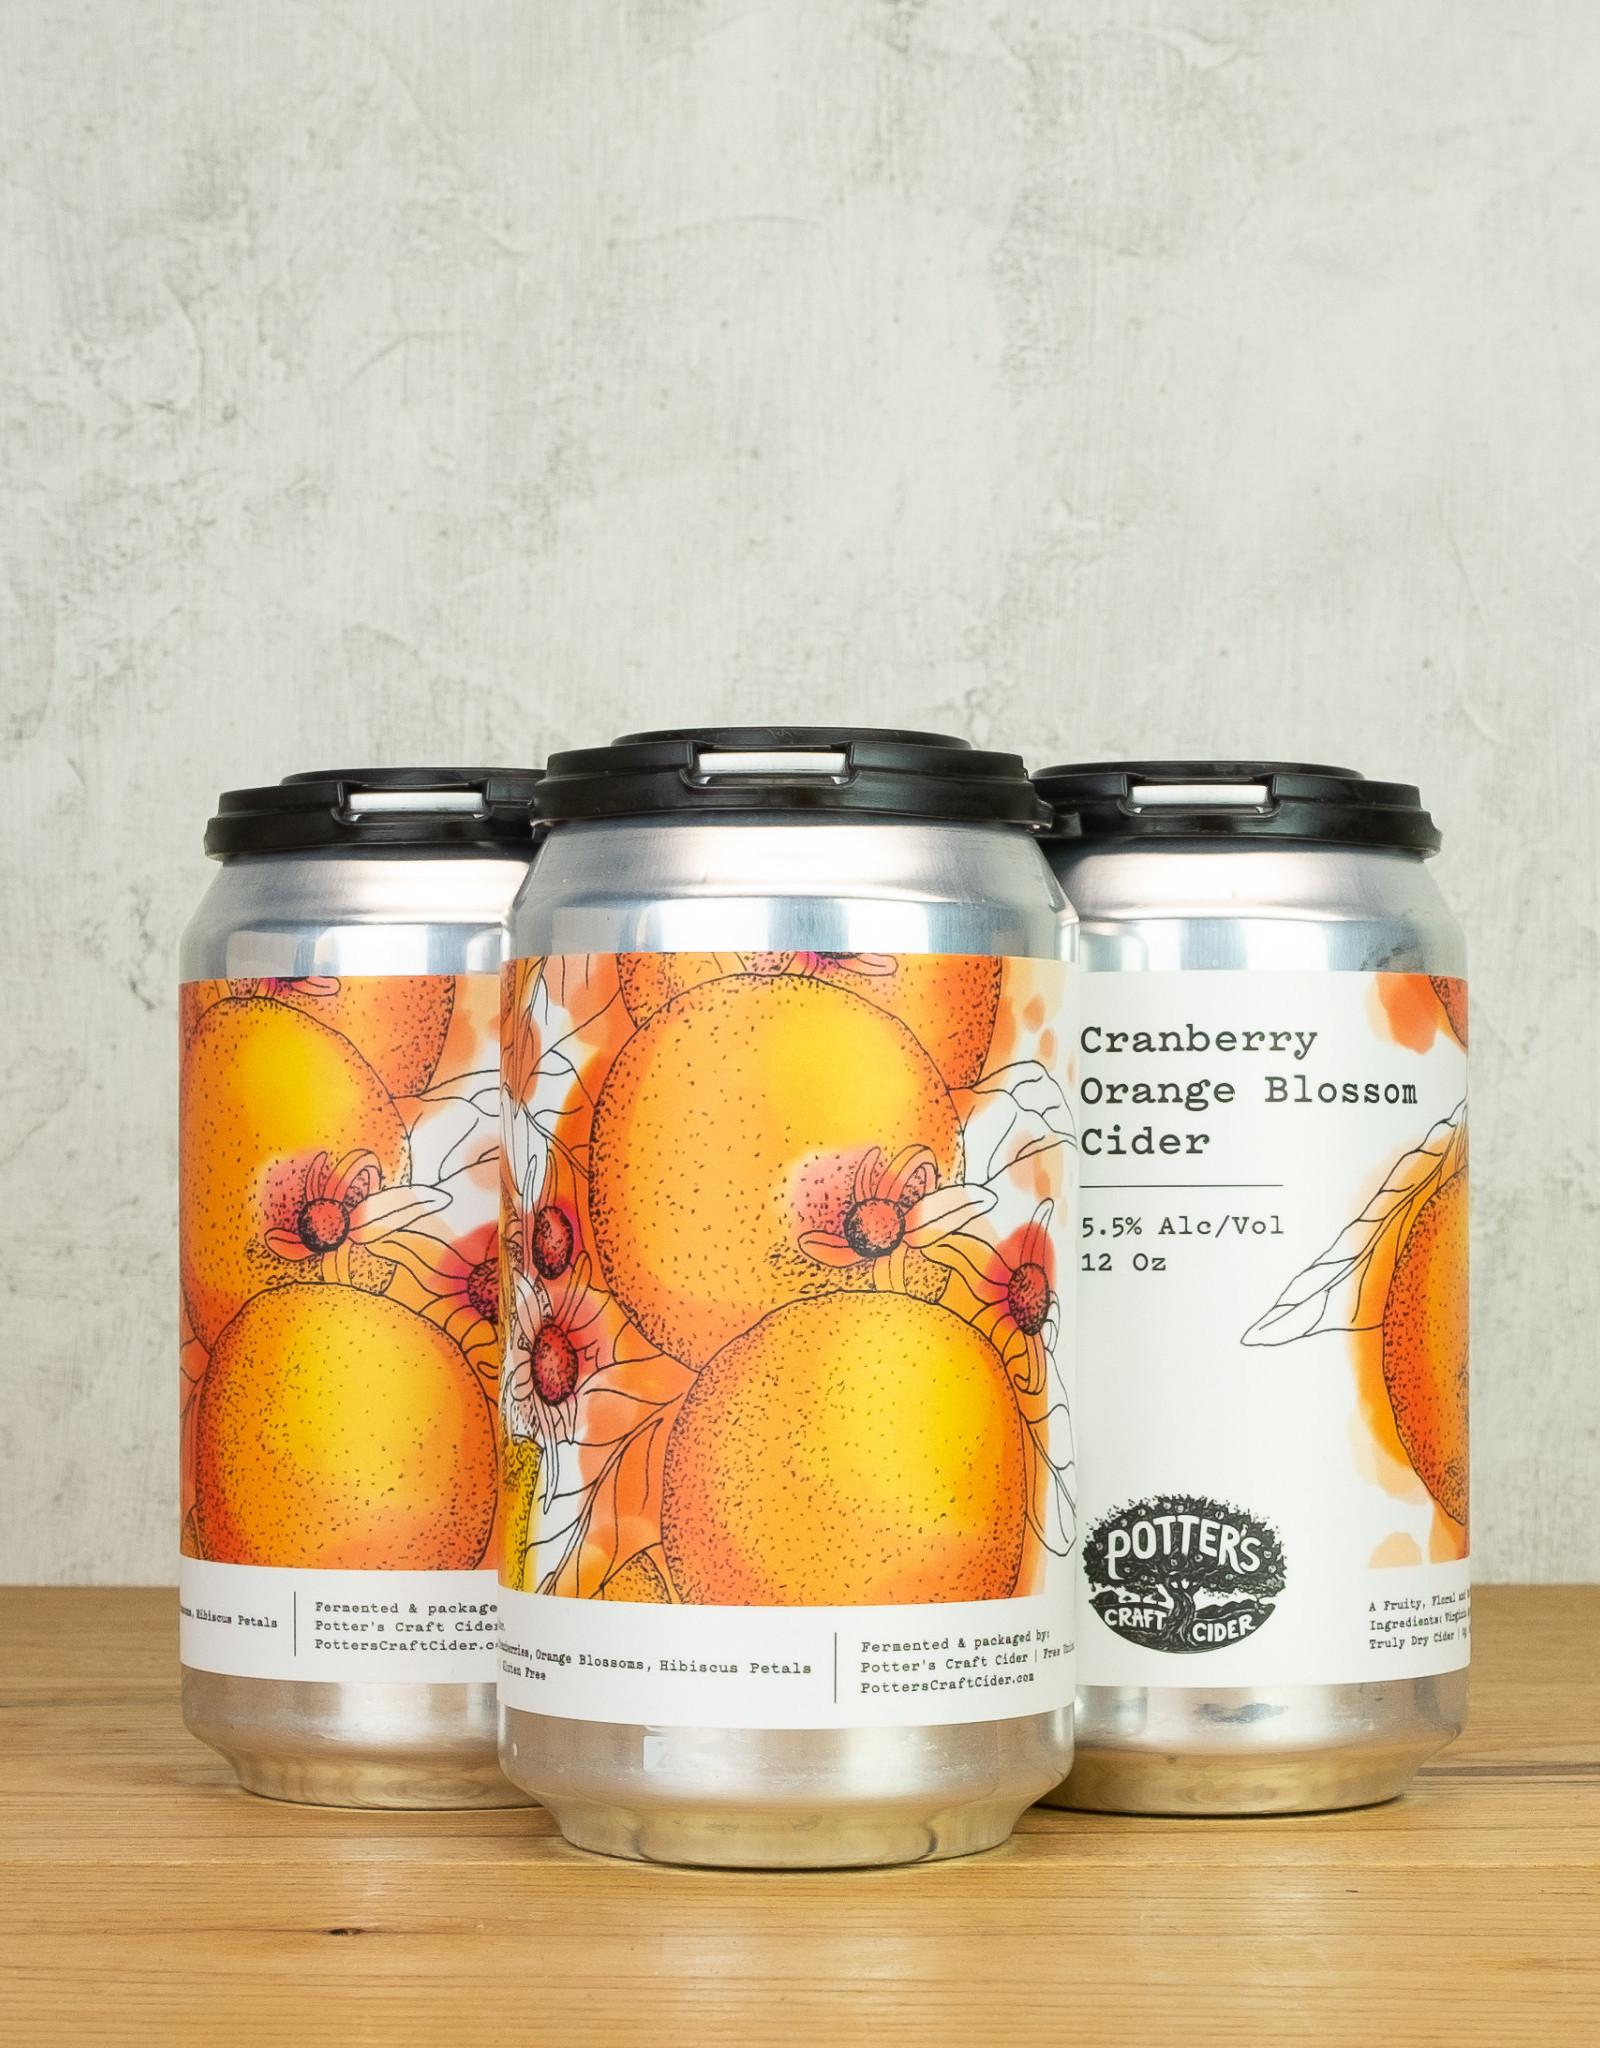 Potter's Cider Cranberry Orange Blossom 4pk